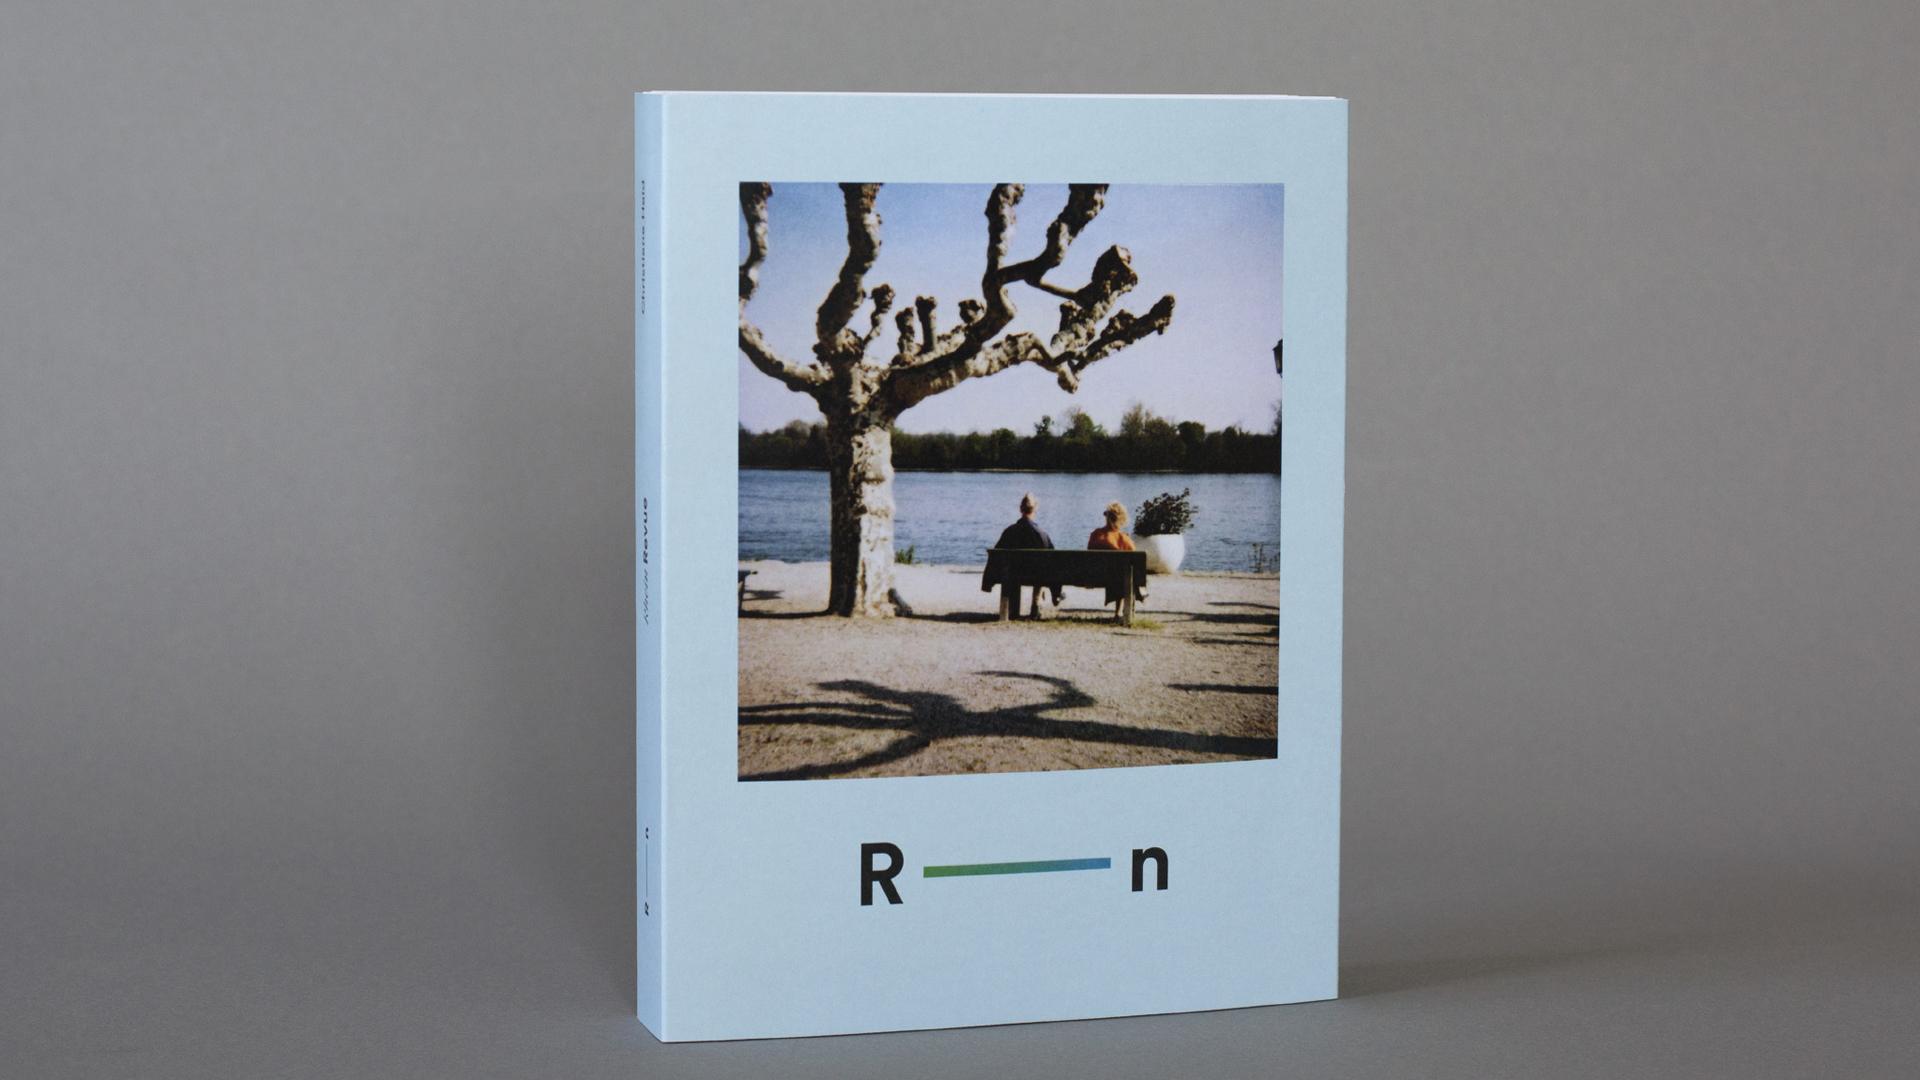 Relaxing RheinRevue Accordion-Fold Book